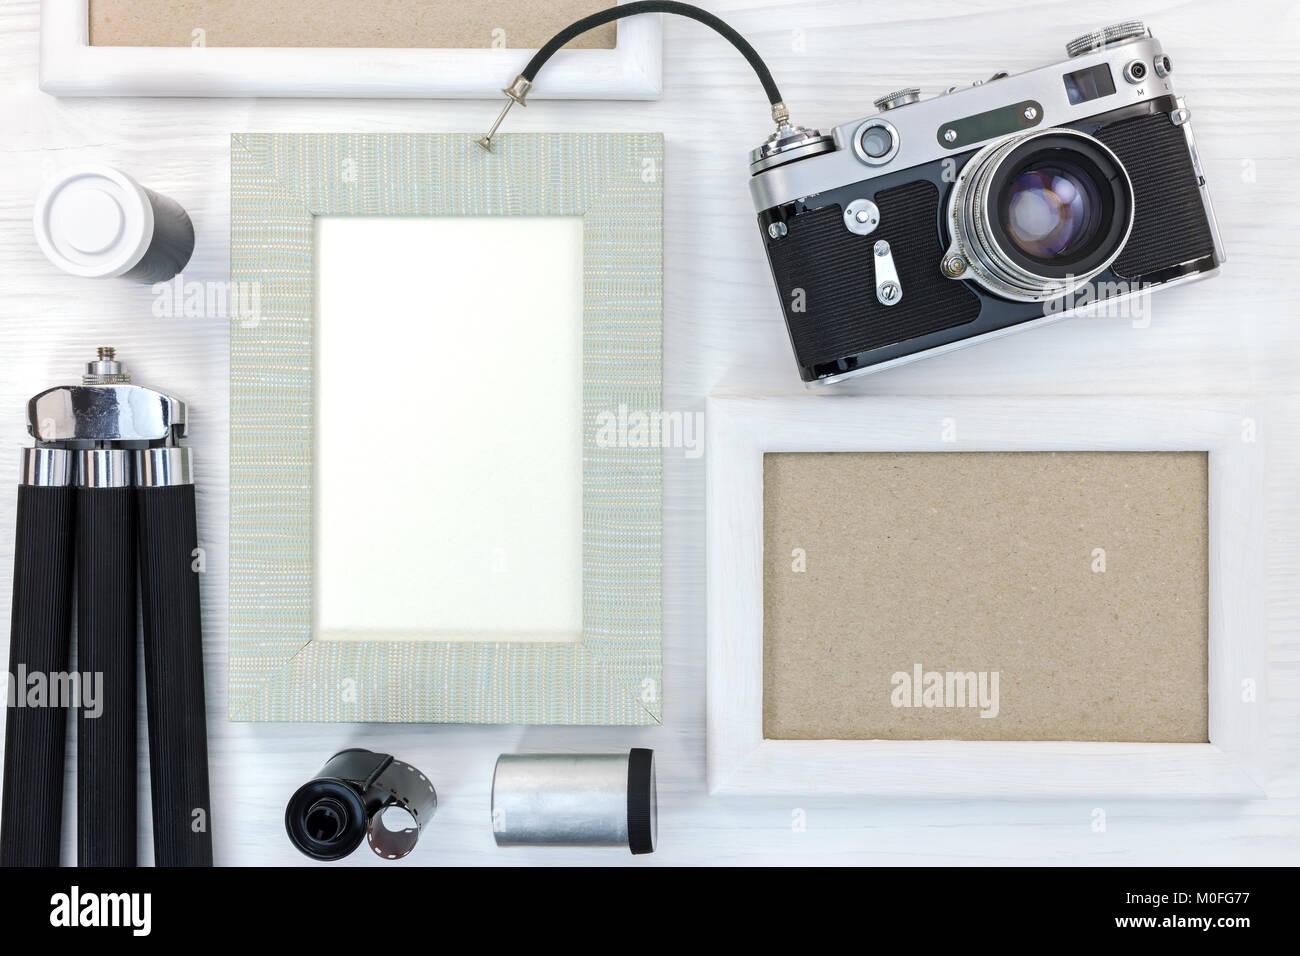 old memories concept - retro camera, empty photo frames, negative ...